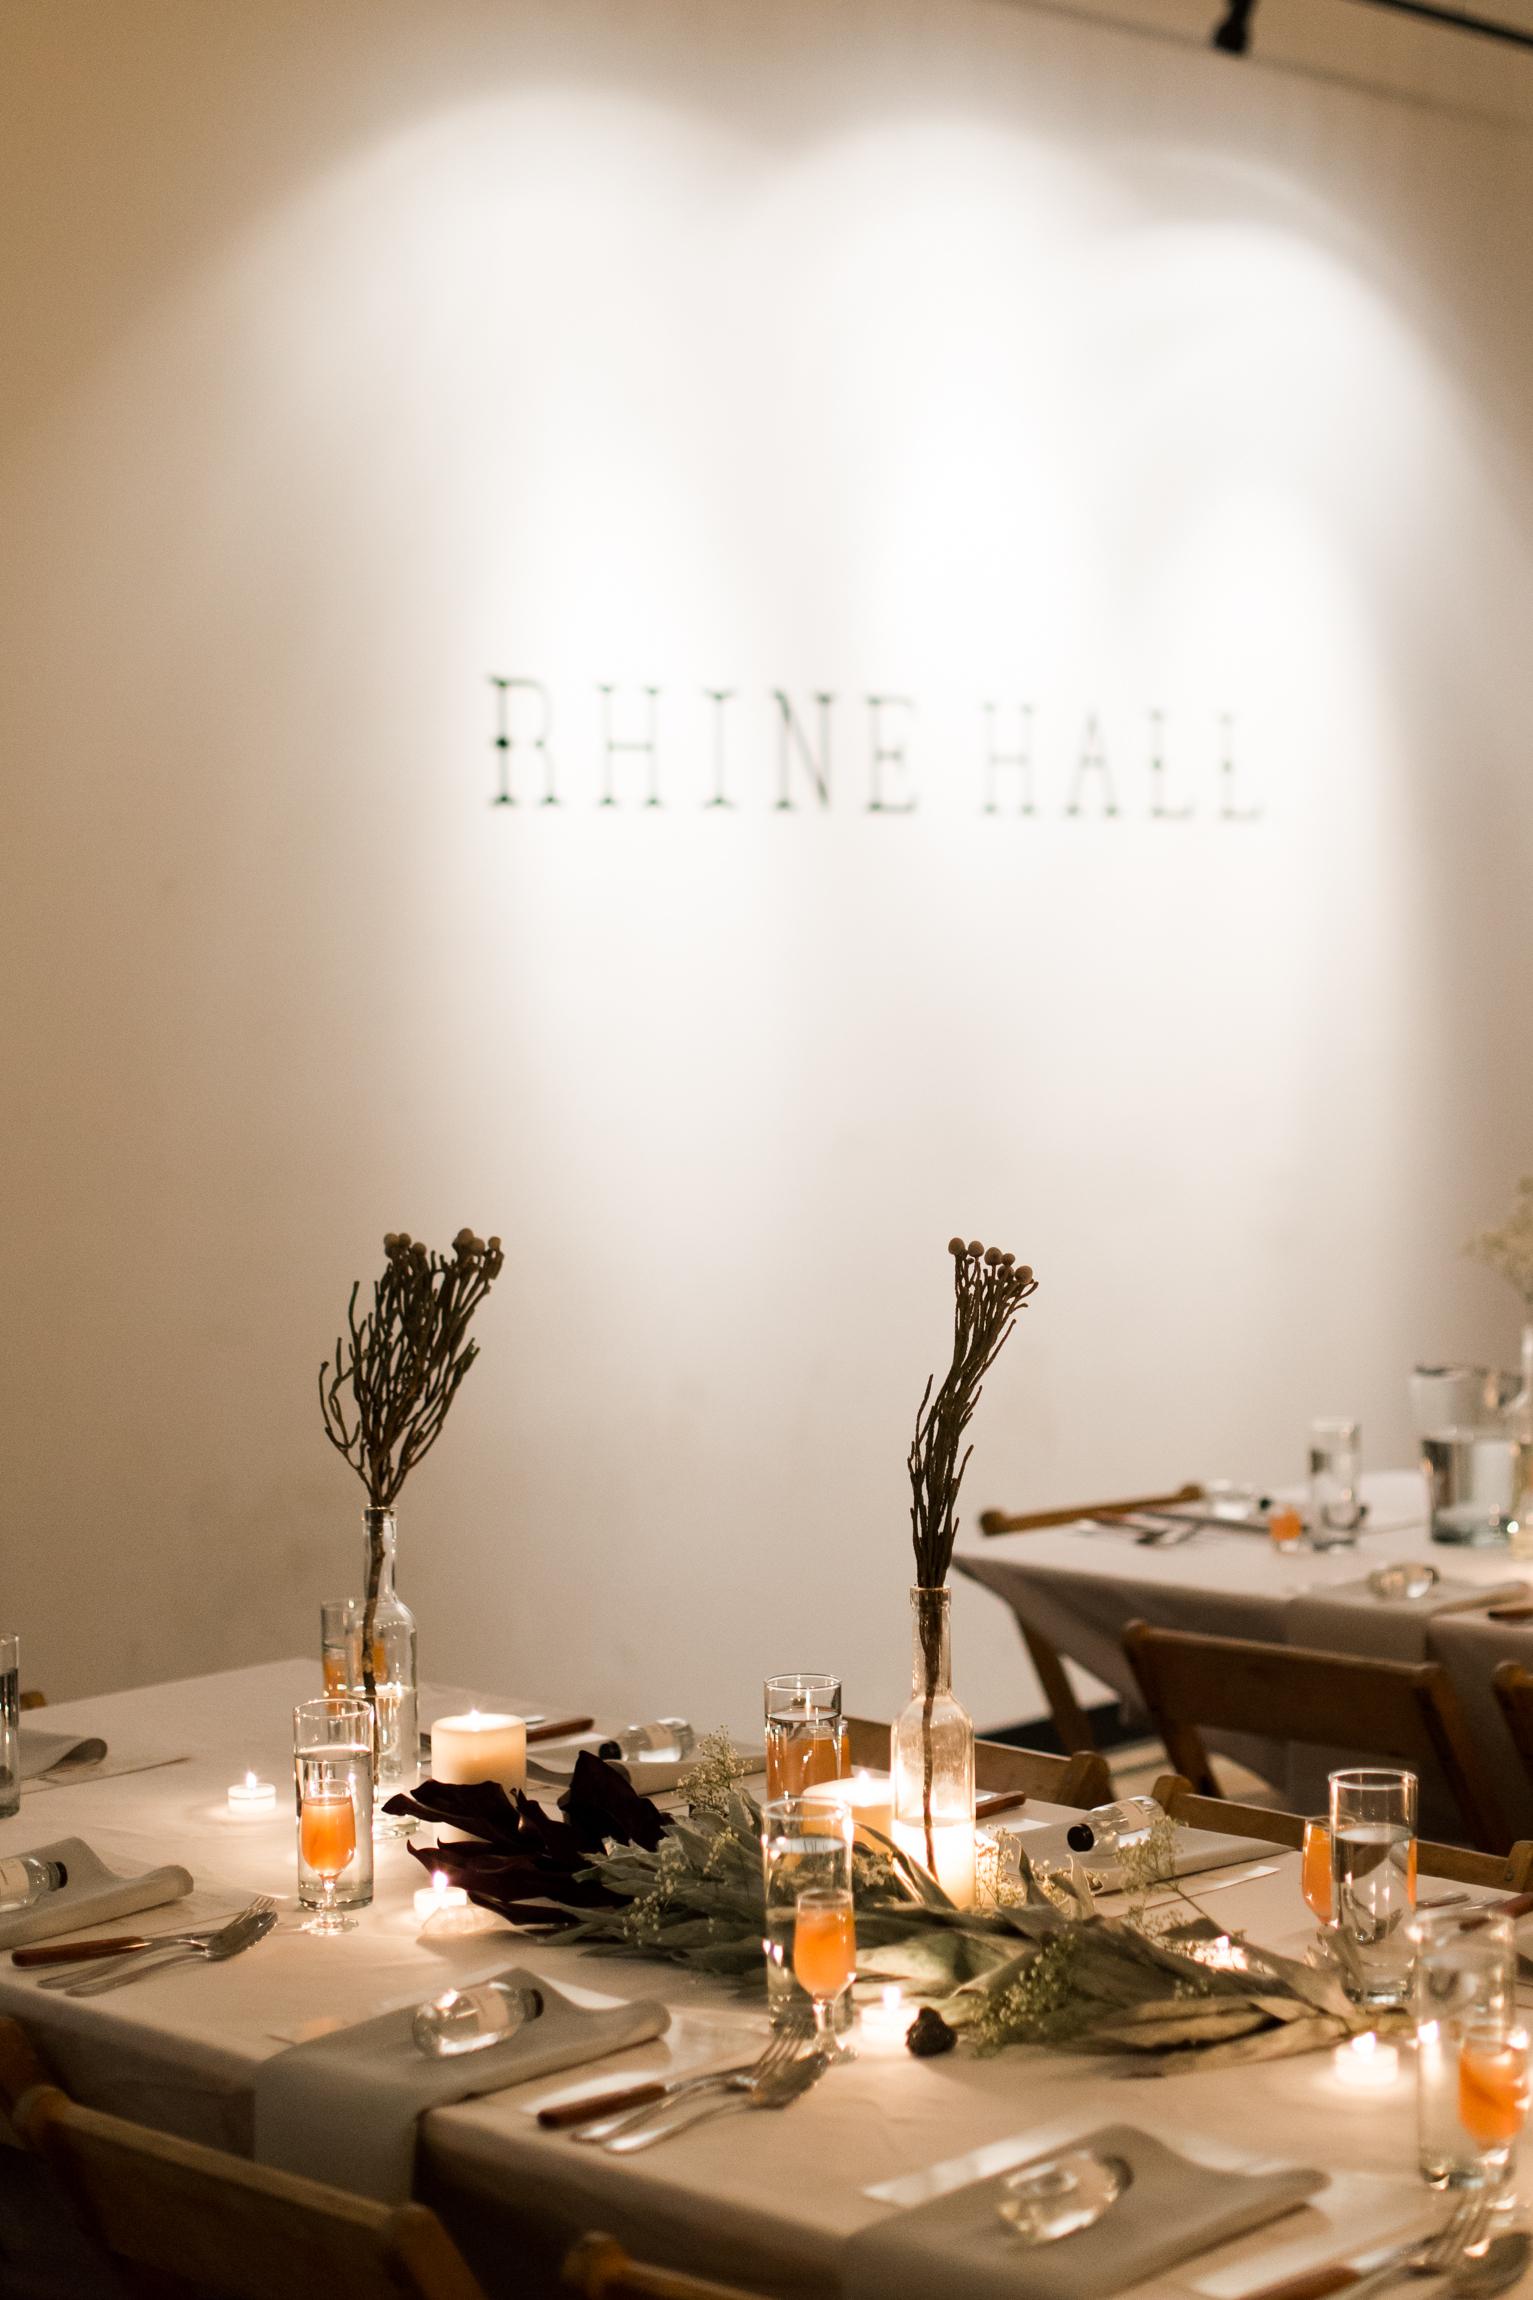 Rhine Hall-The Inside Outfit-Carolina Rodriguez.jpg